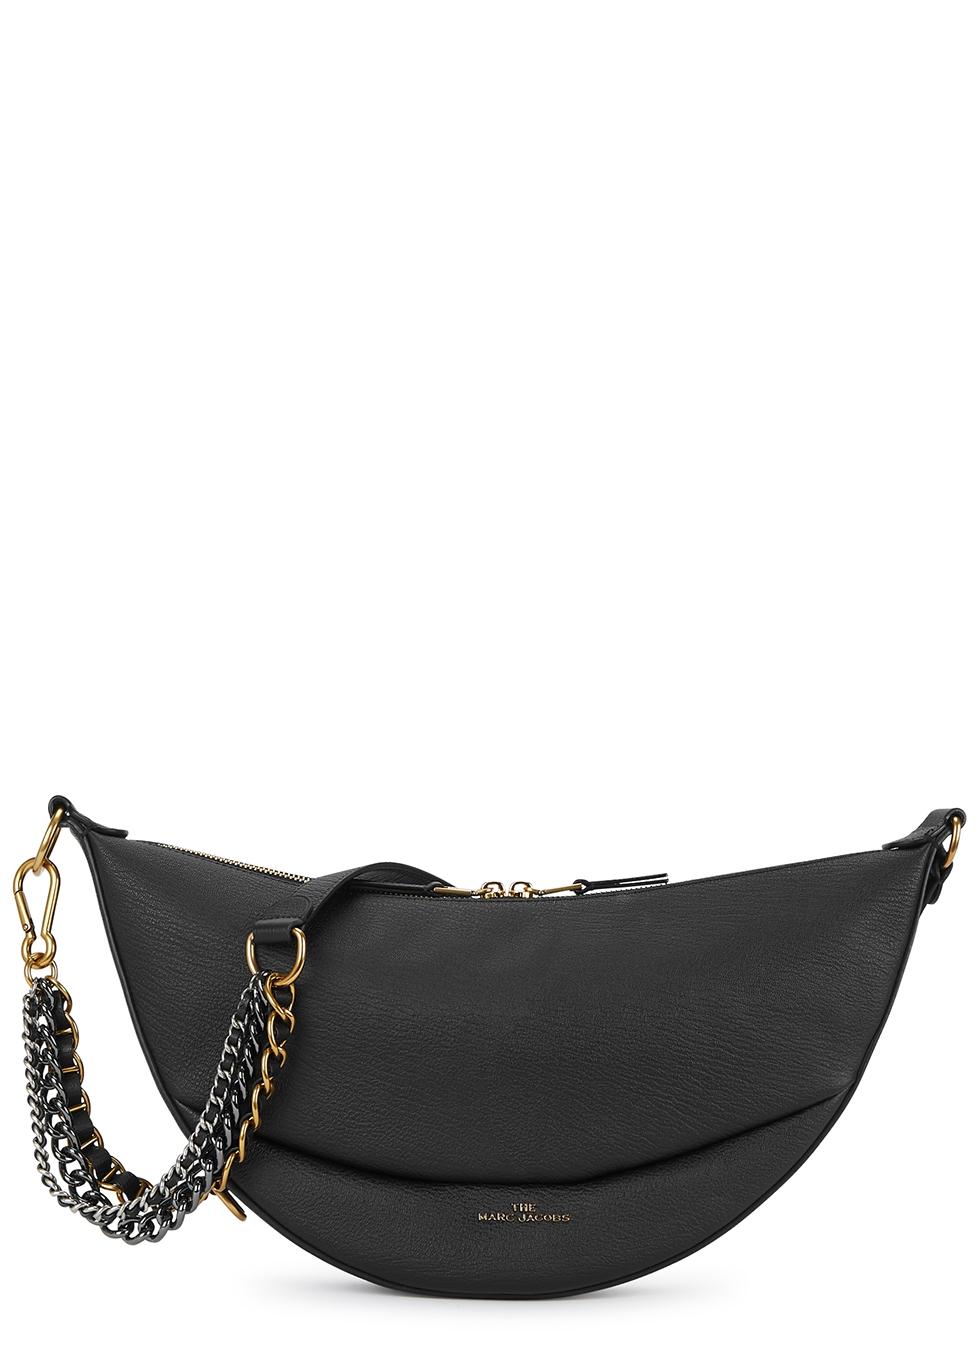 The Eclipse mini black leather shoulder bag